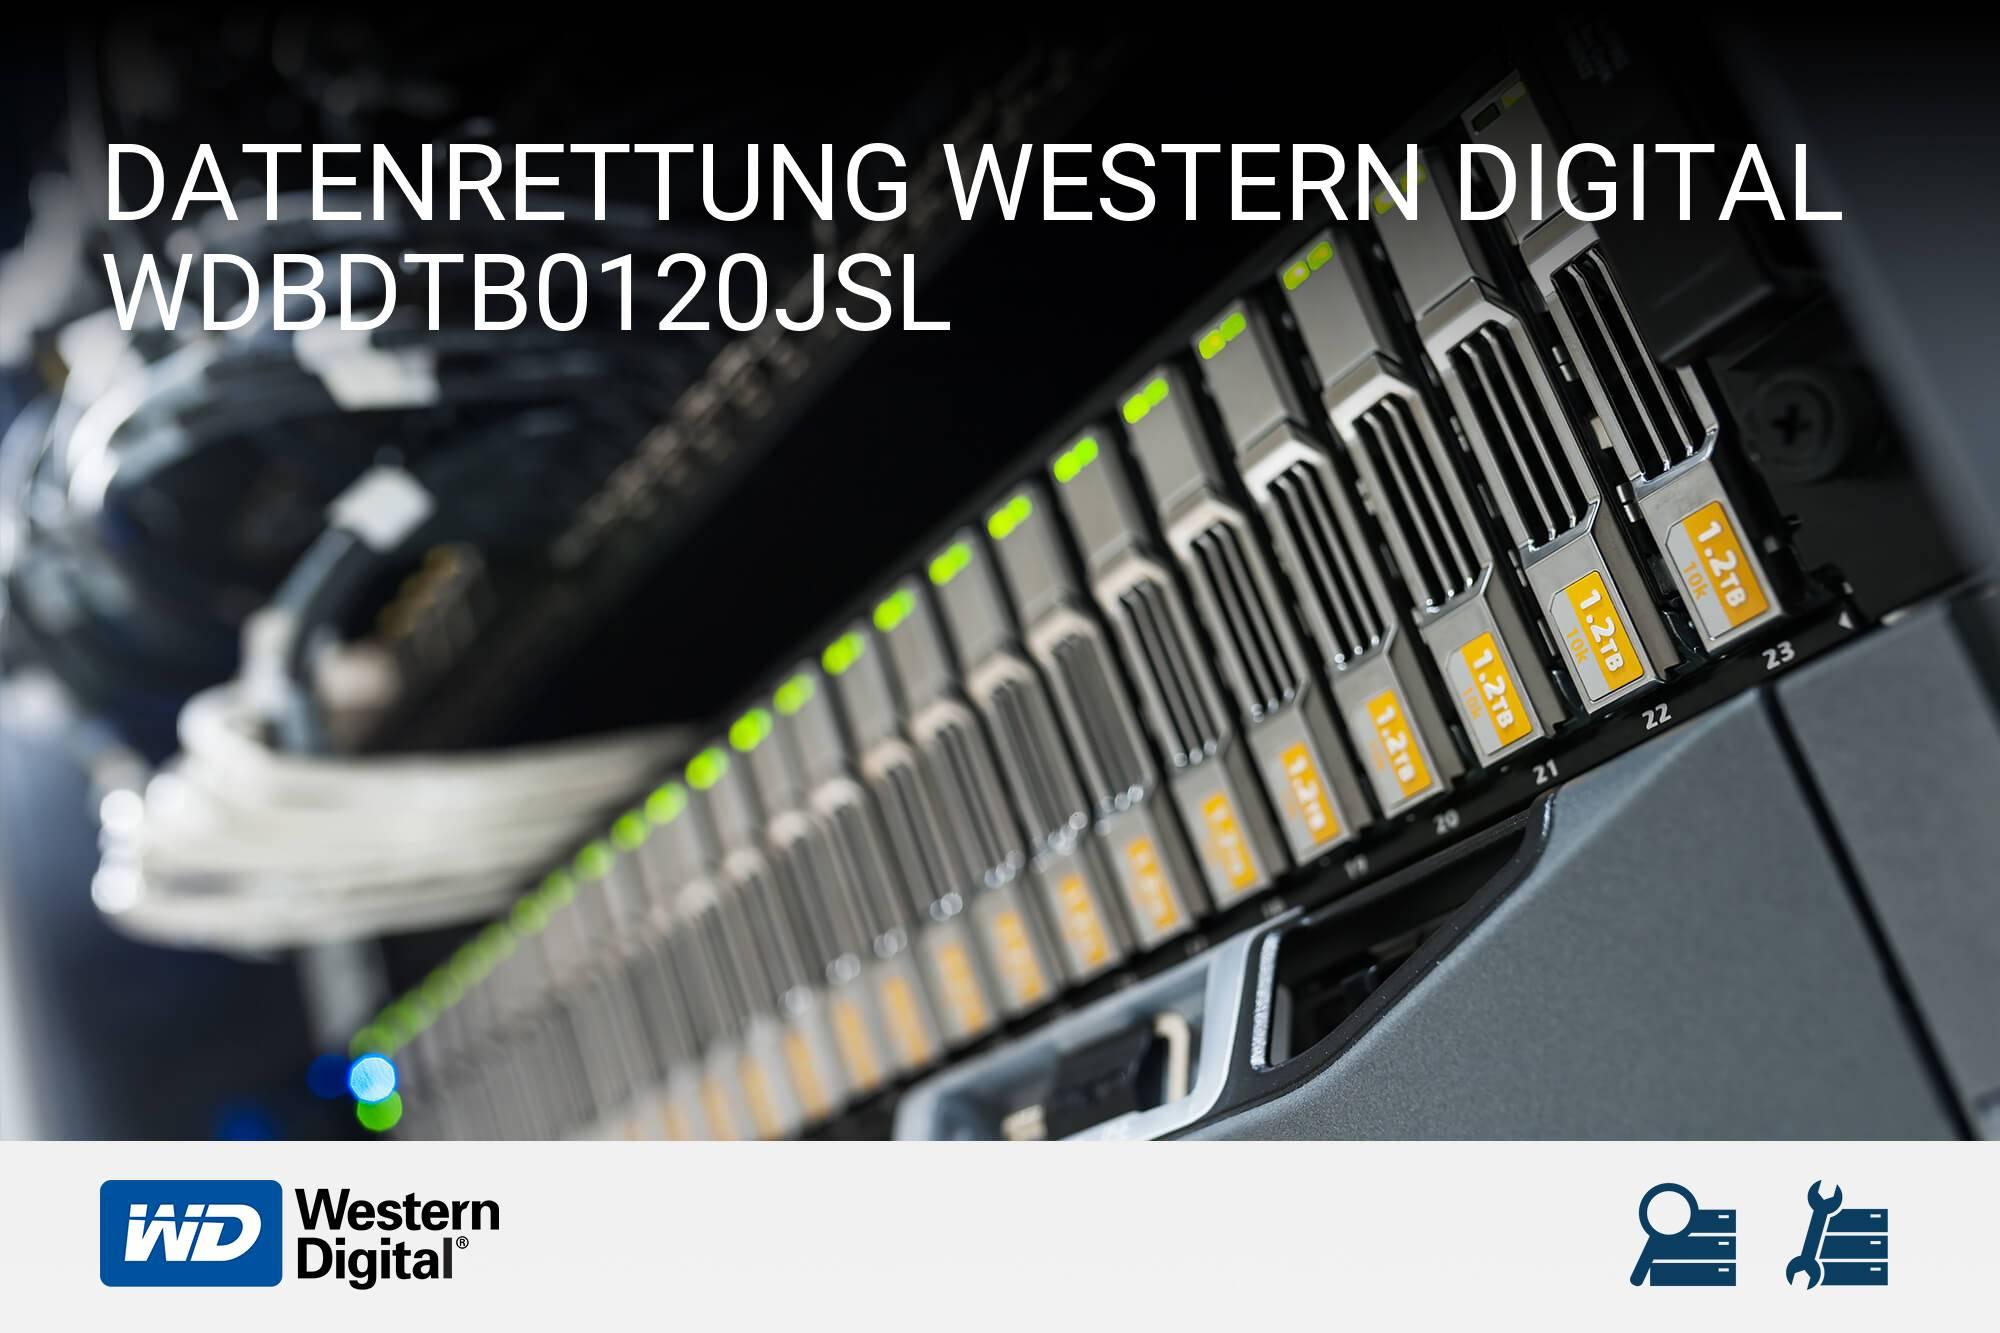 Western Digital WDBDTB0120JSL